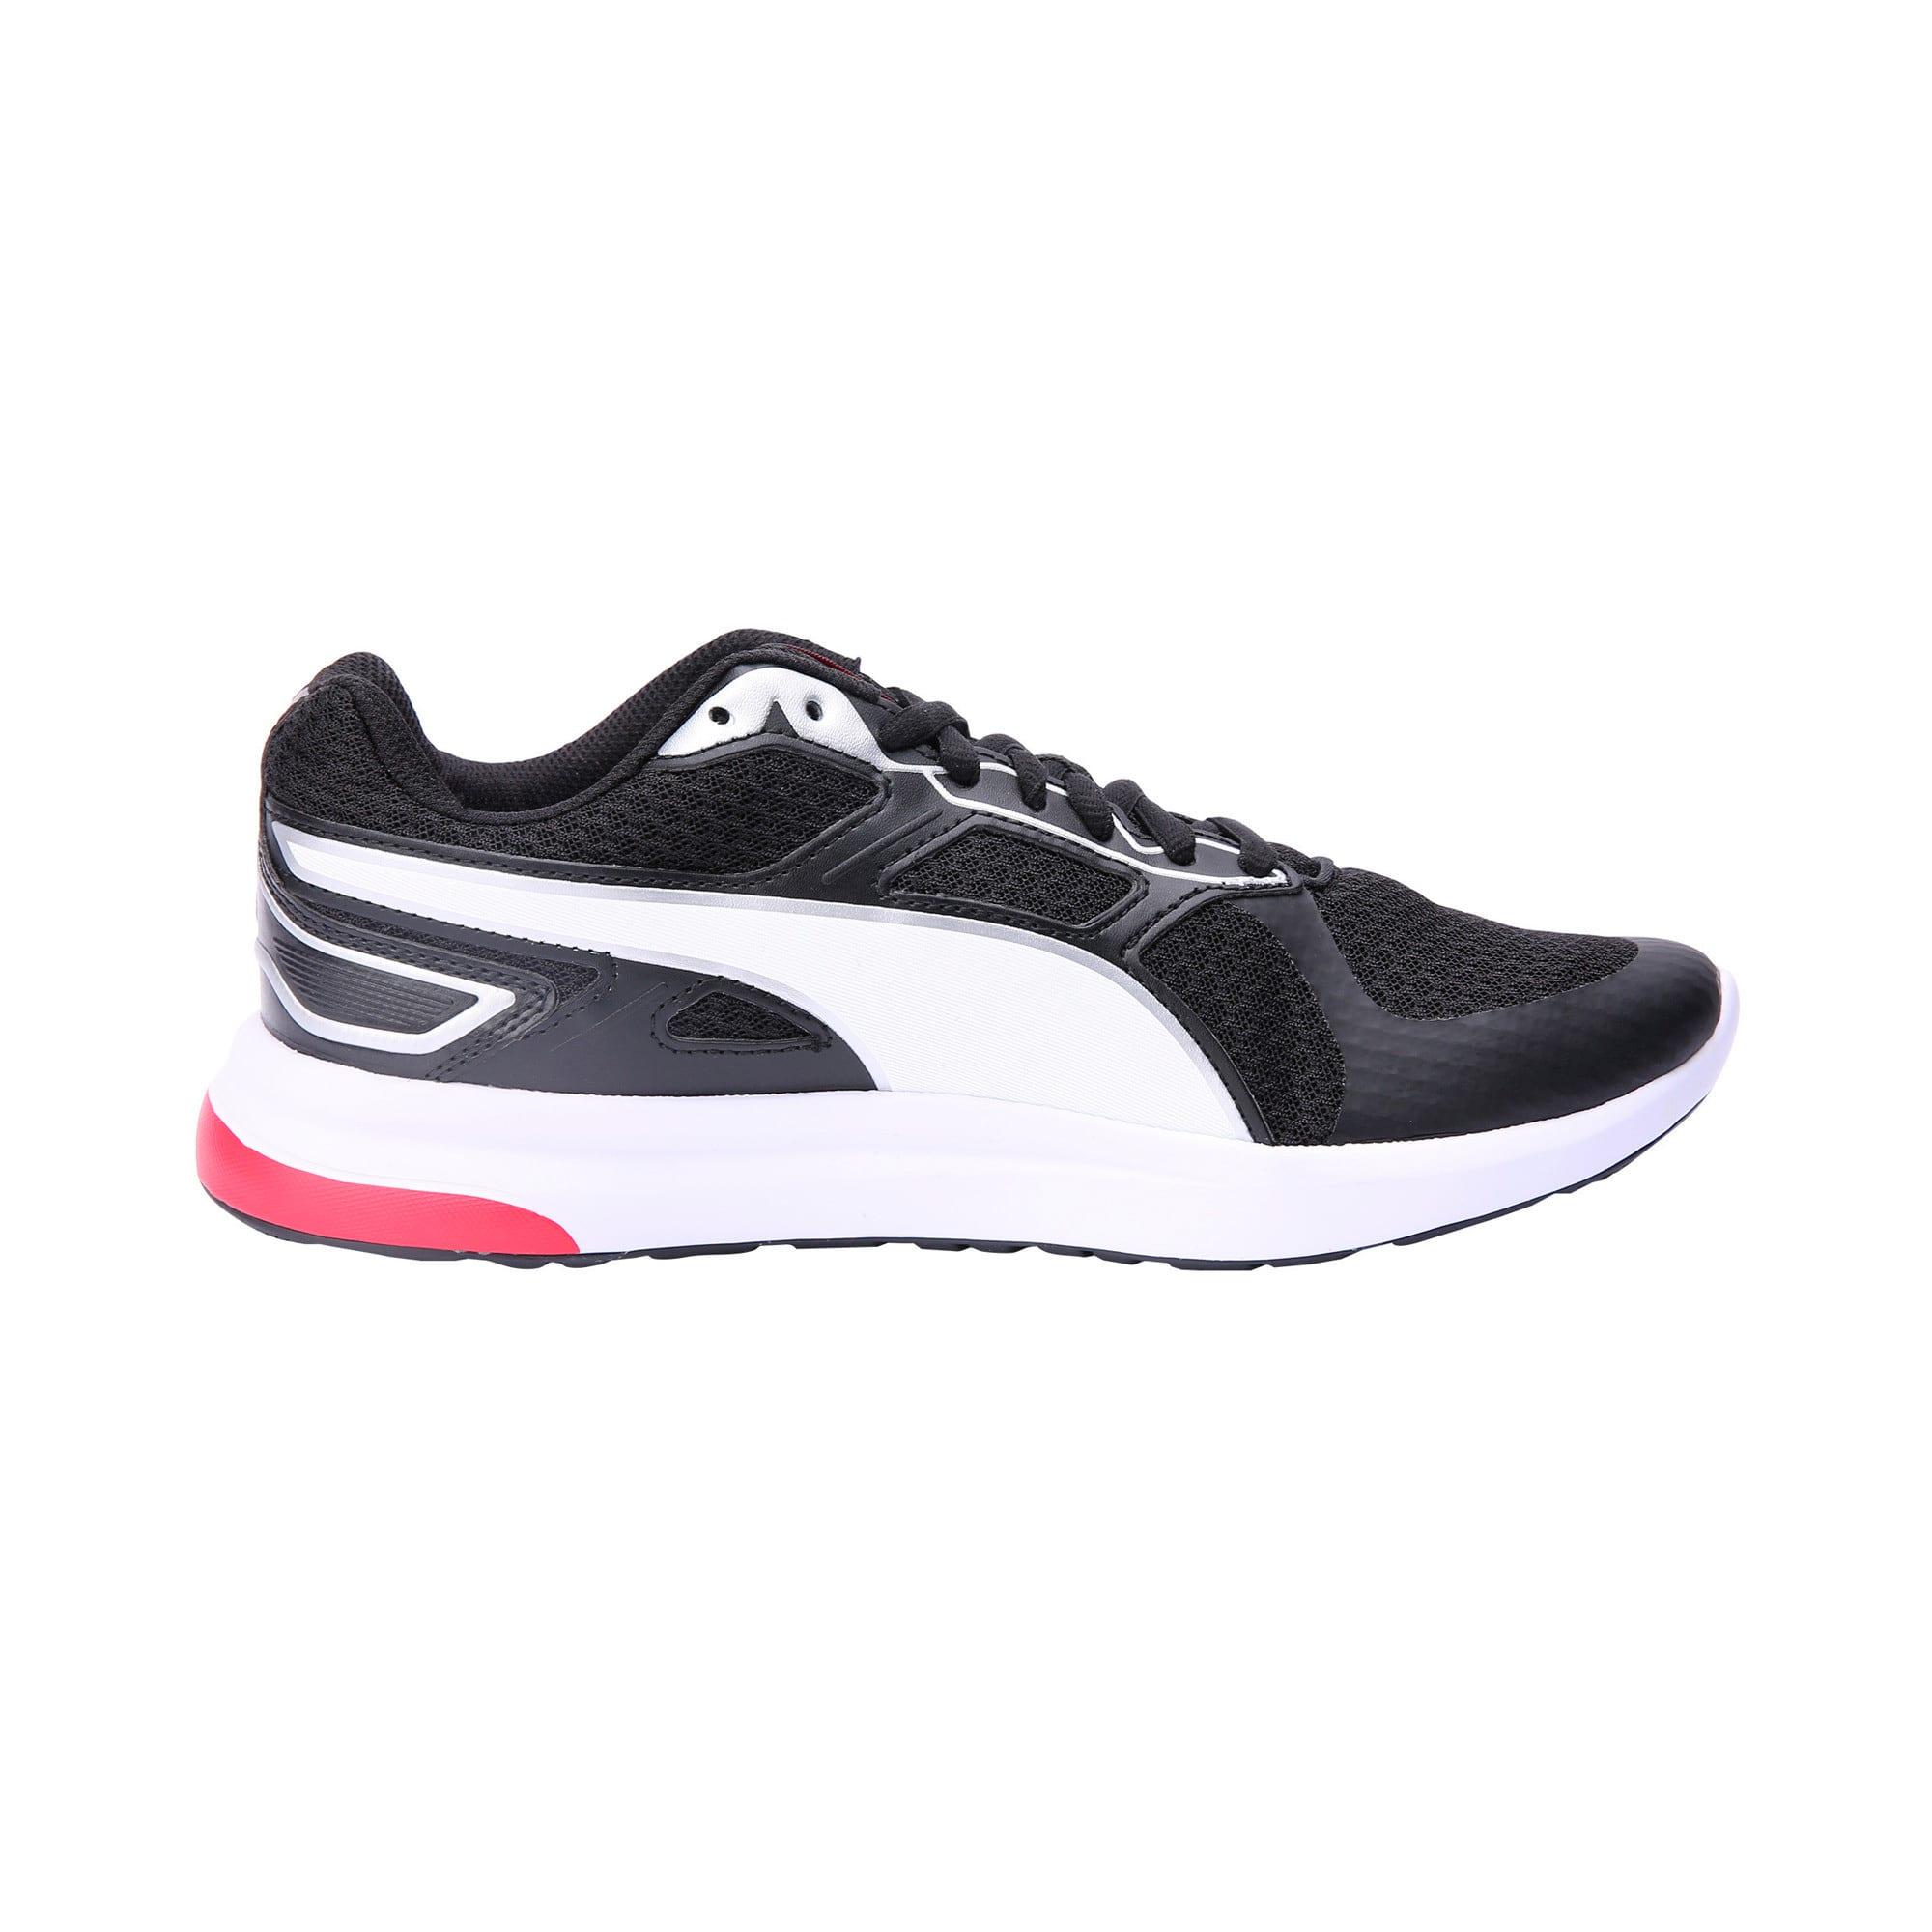 Thumbnail 5 of Escaper Tech Sneakers, P. Black-P. White-Fl.Scarlet, medium-IND